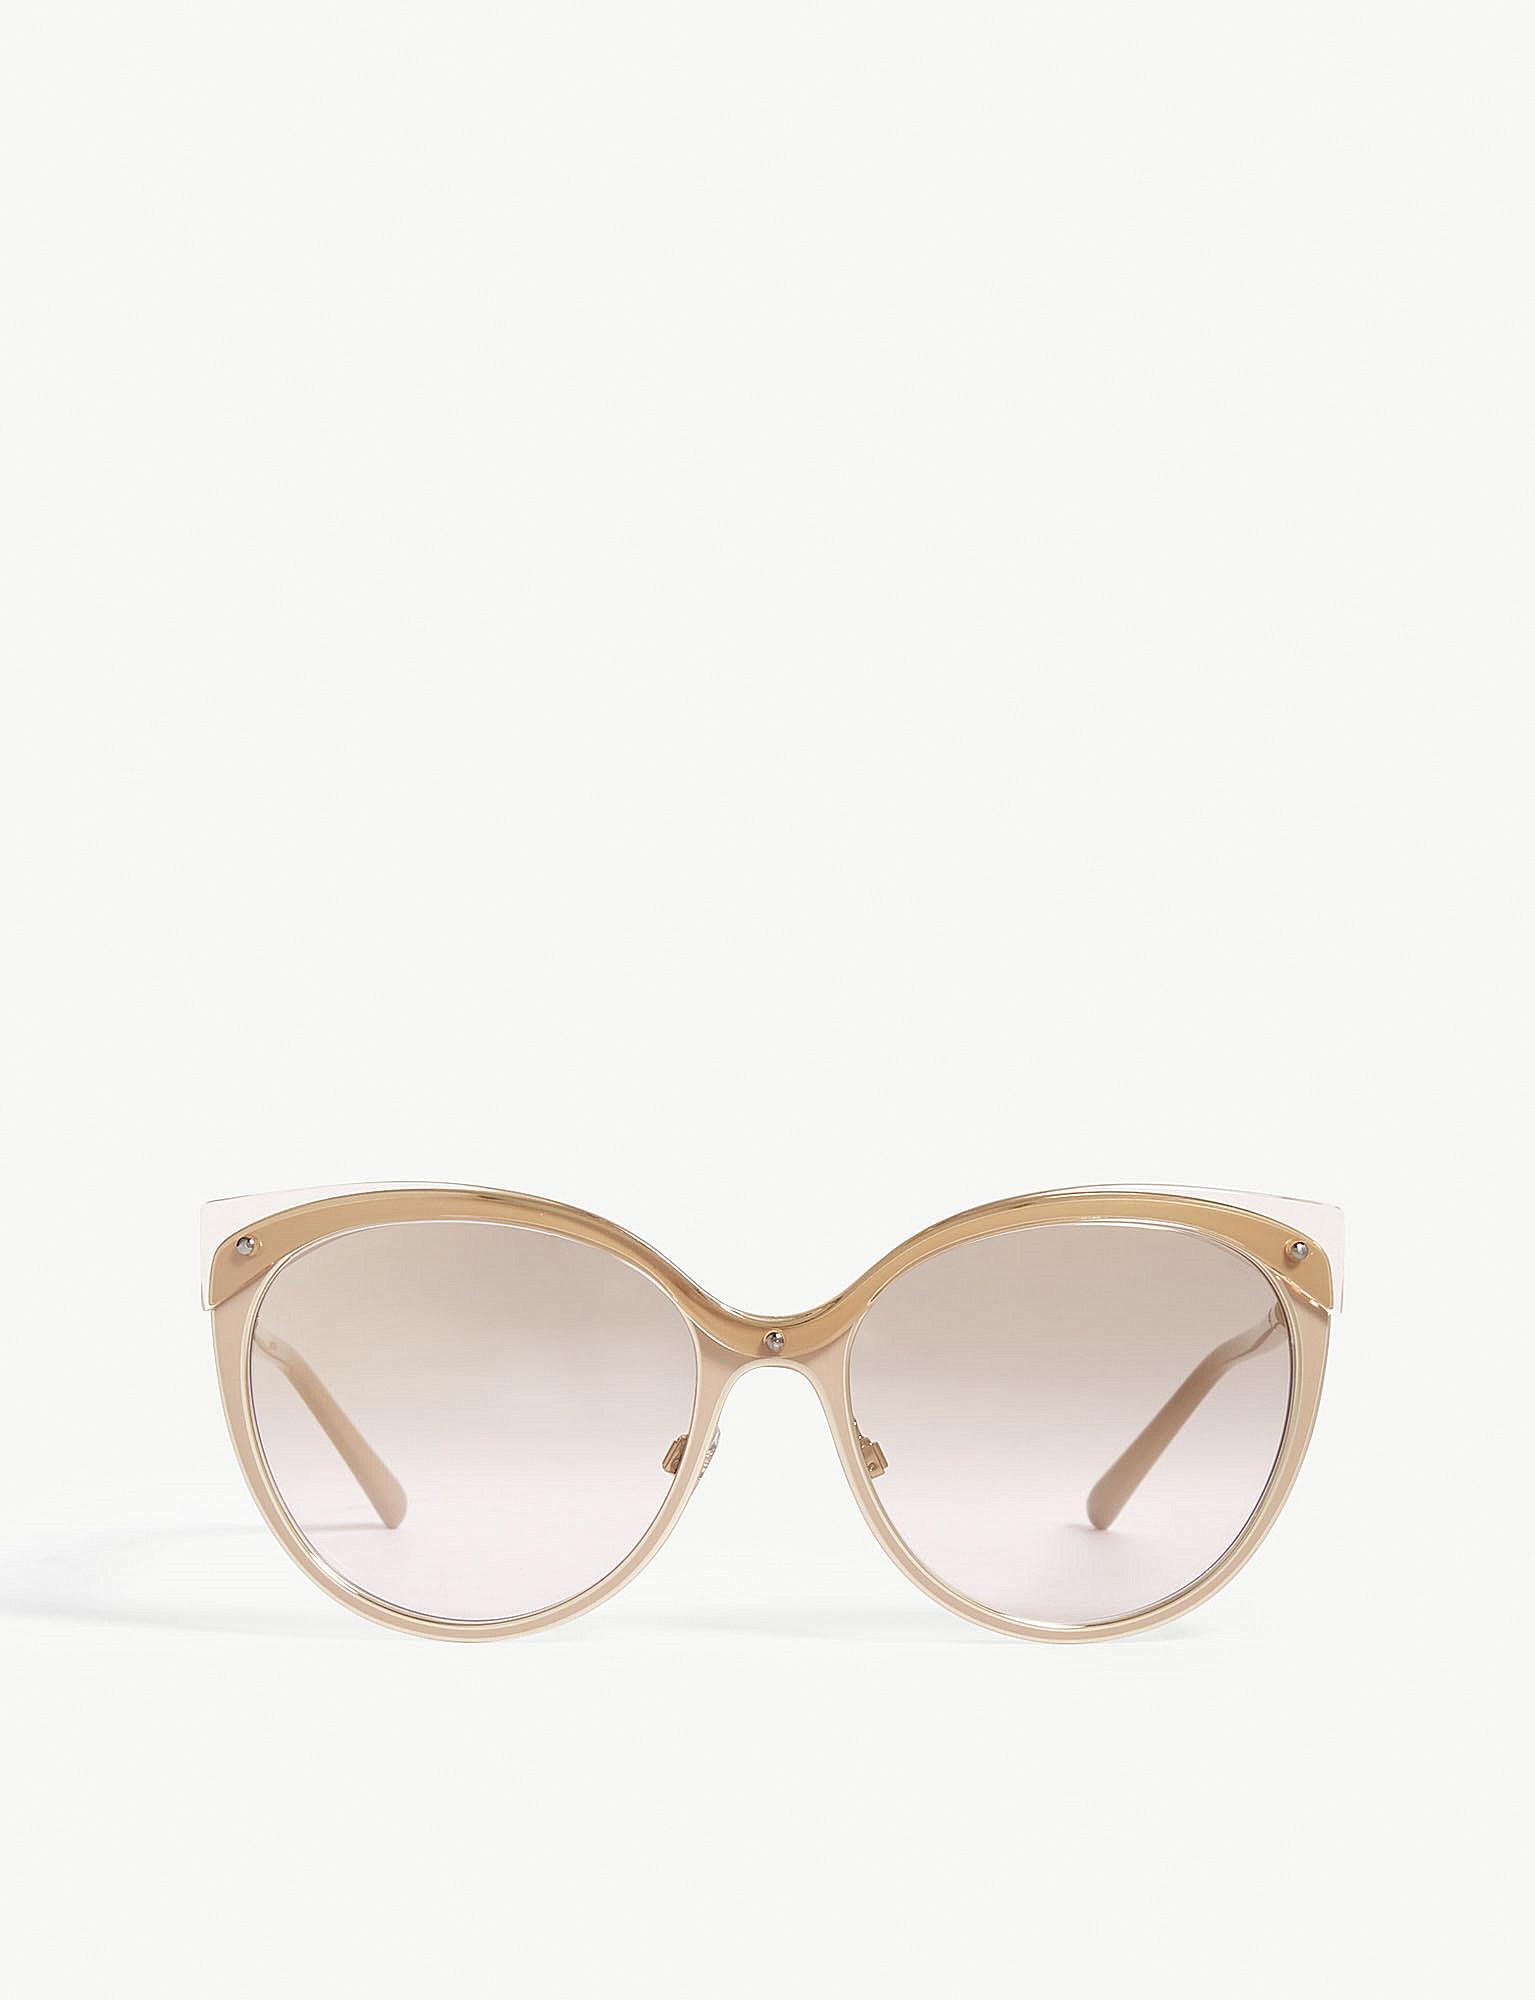 25364cf56e2 Burberry Be3096 Cat-eye Frame Sunglasses in Brown - Lyst